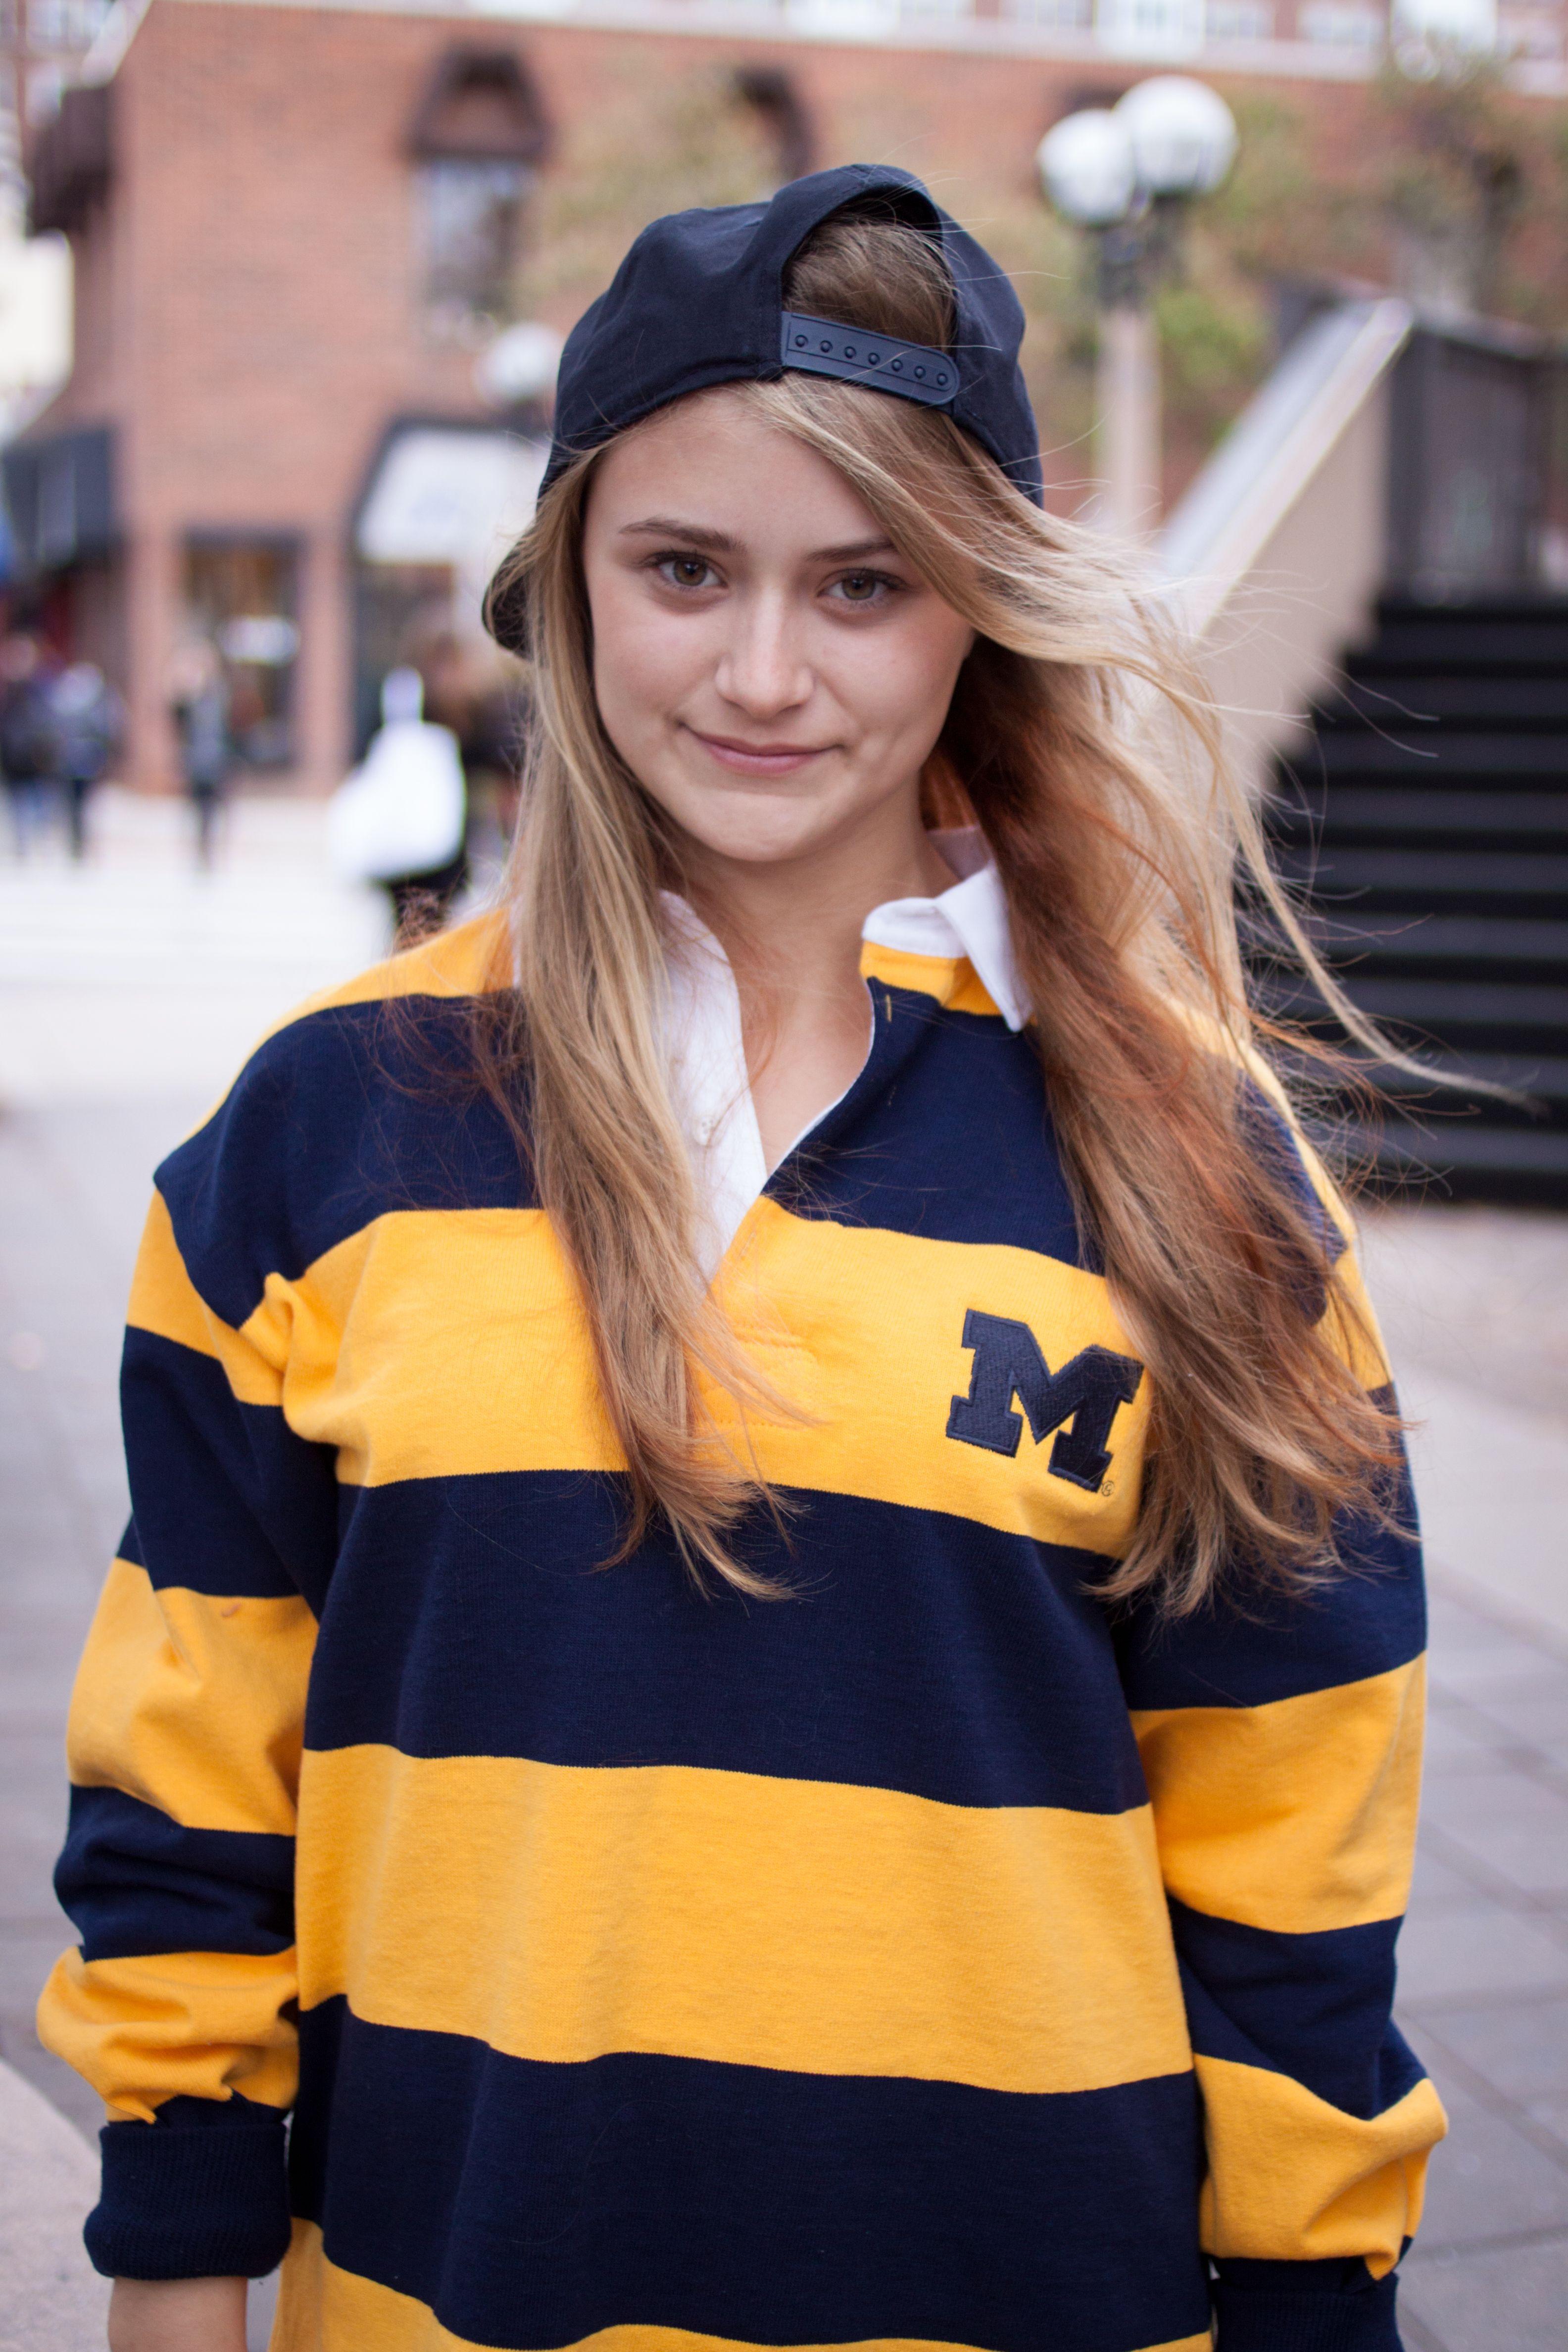 e4da1130ec5323a7be8041fc93e95b0b the michigan rugby is a great sweatshirt alternative, keeping you,U Of M Womens Clothing